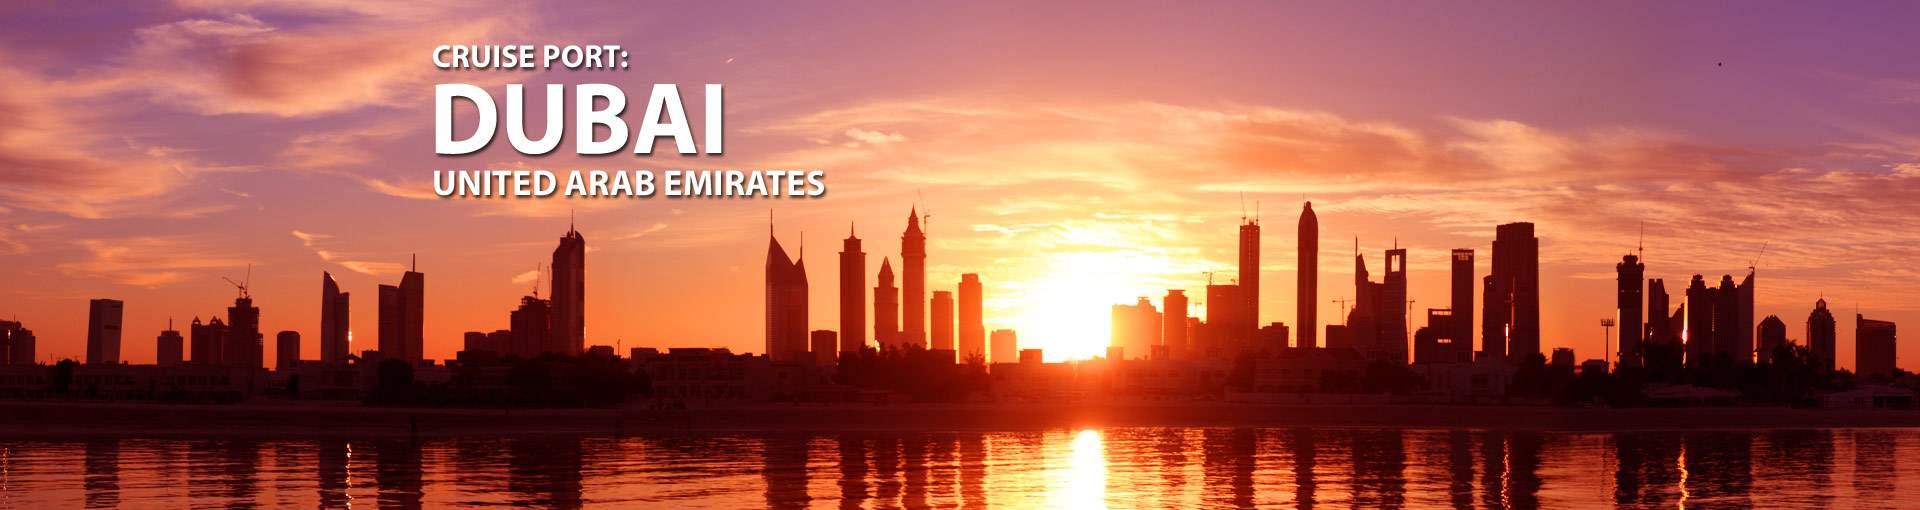 Cruises from Dubai, United Arab Emirates